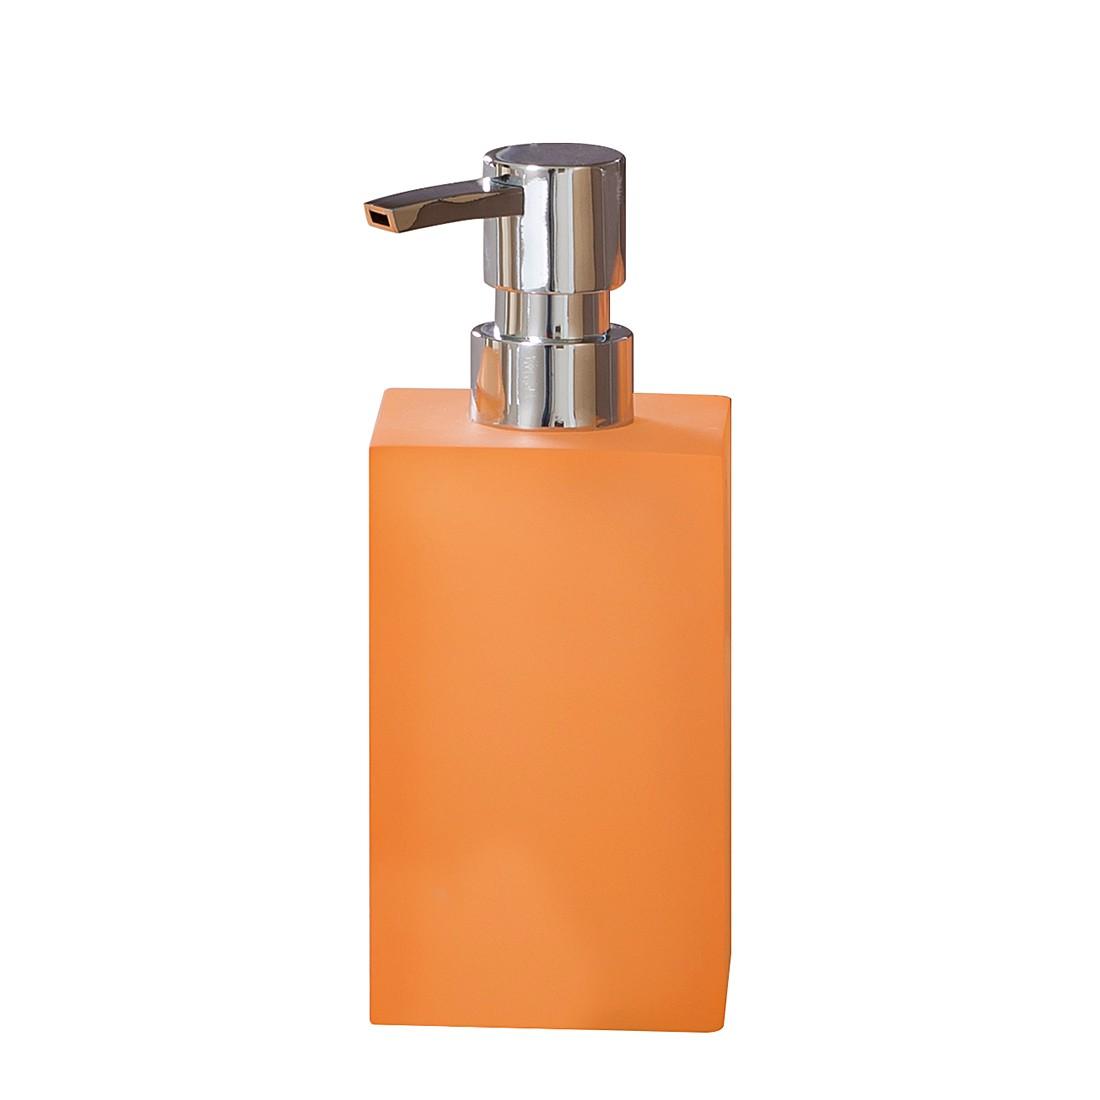 Zeepdispenser Cube - mandarijnkleurig, Nicol Wohnausstattungen